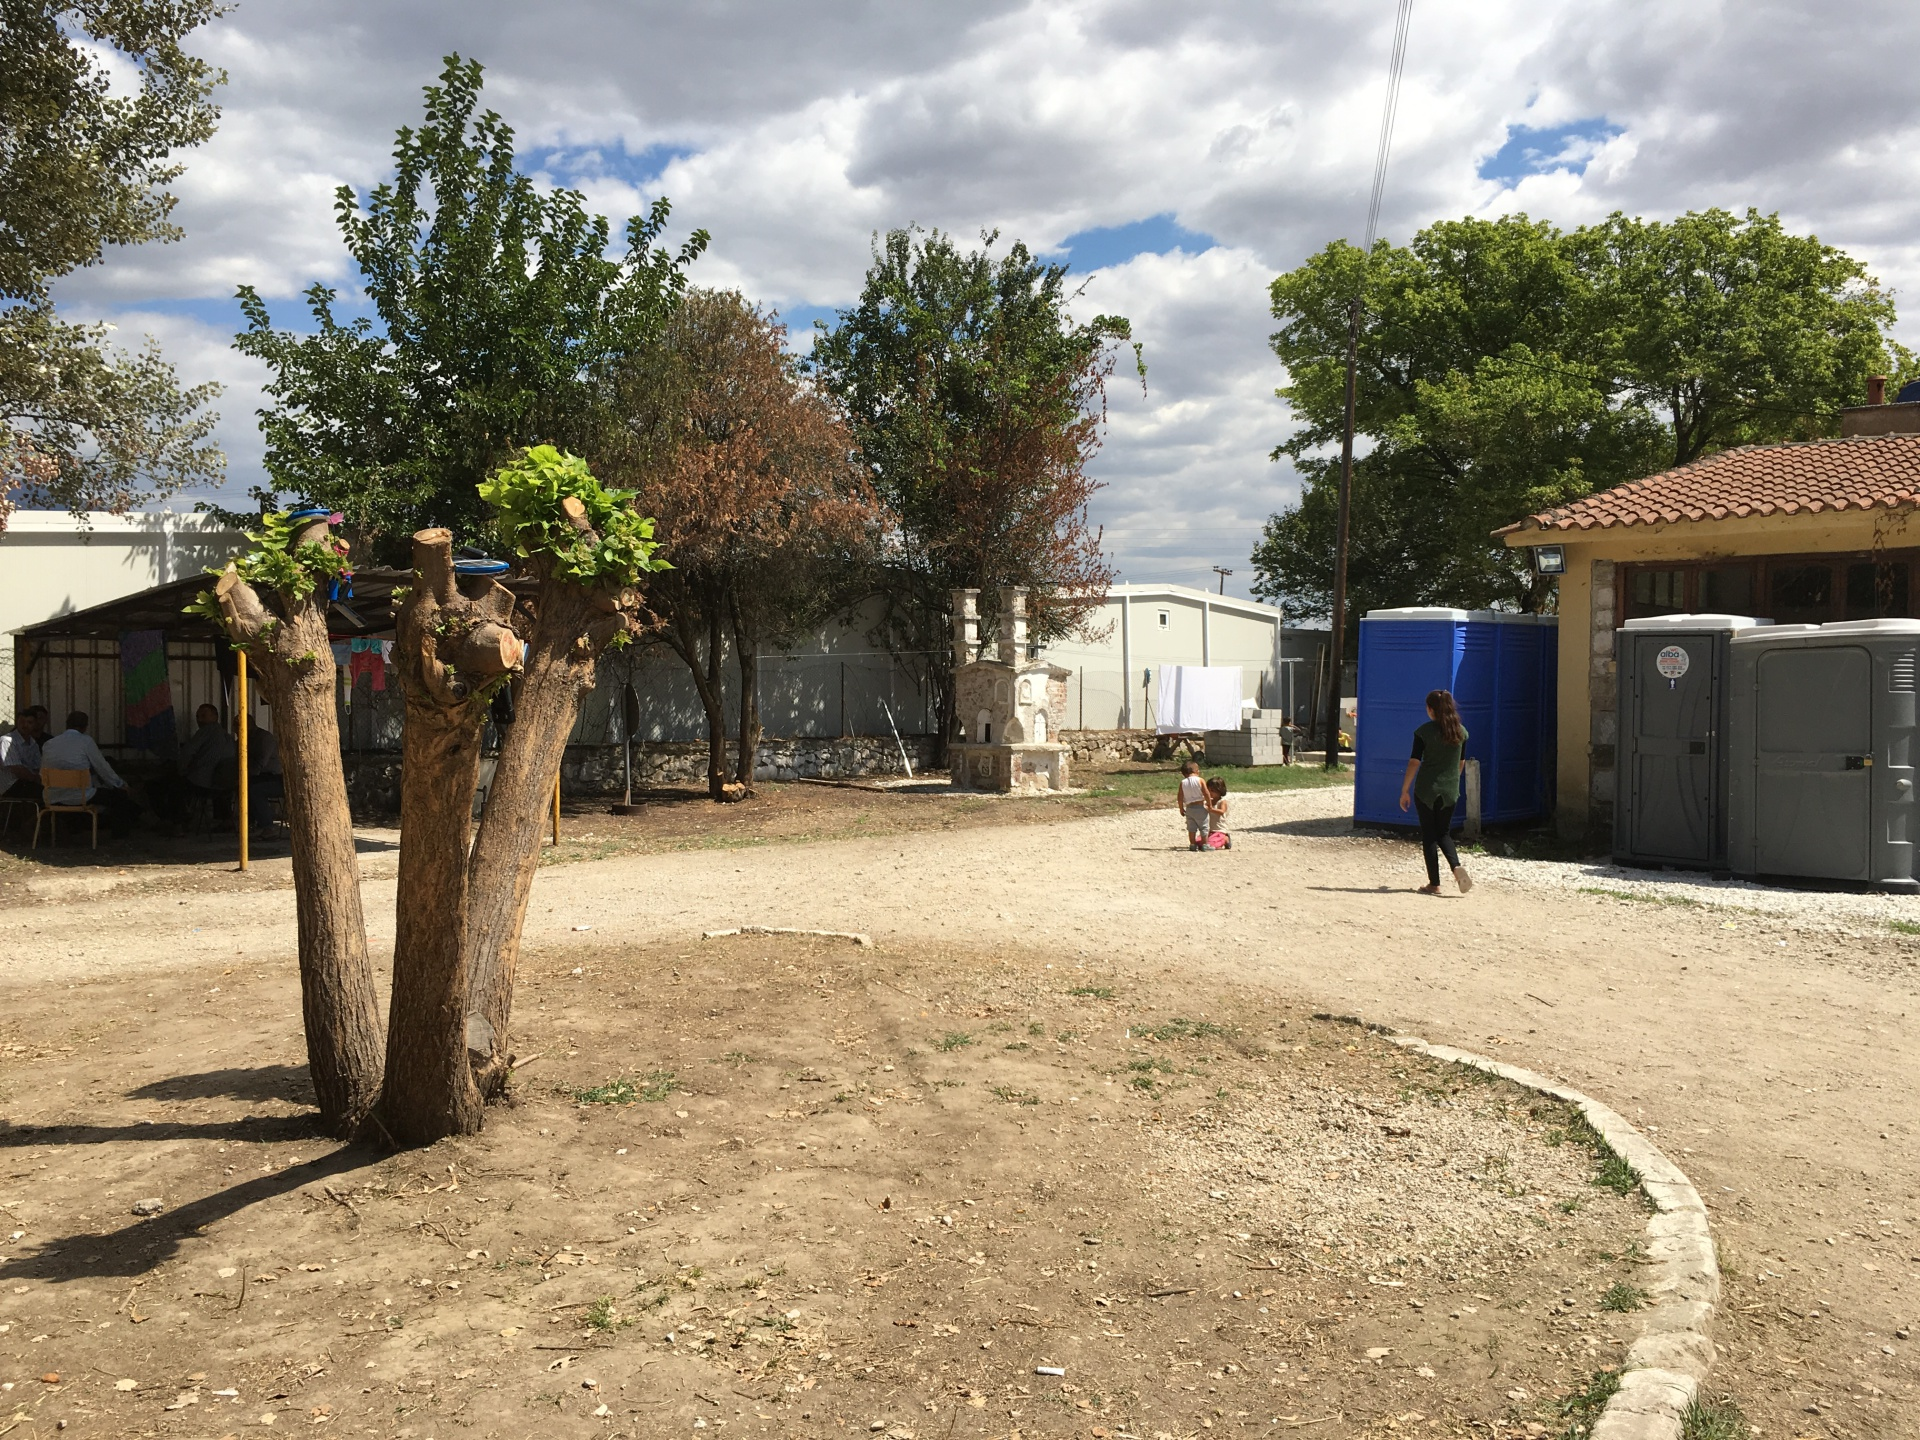 Edlumino Blog : Curriculum matters in Greece